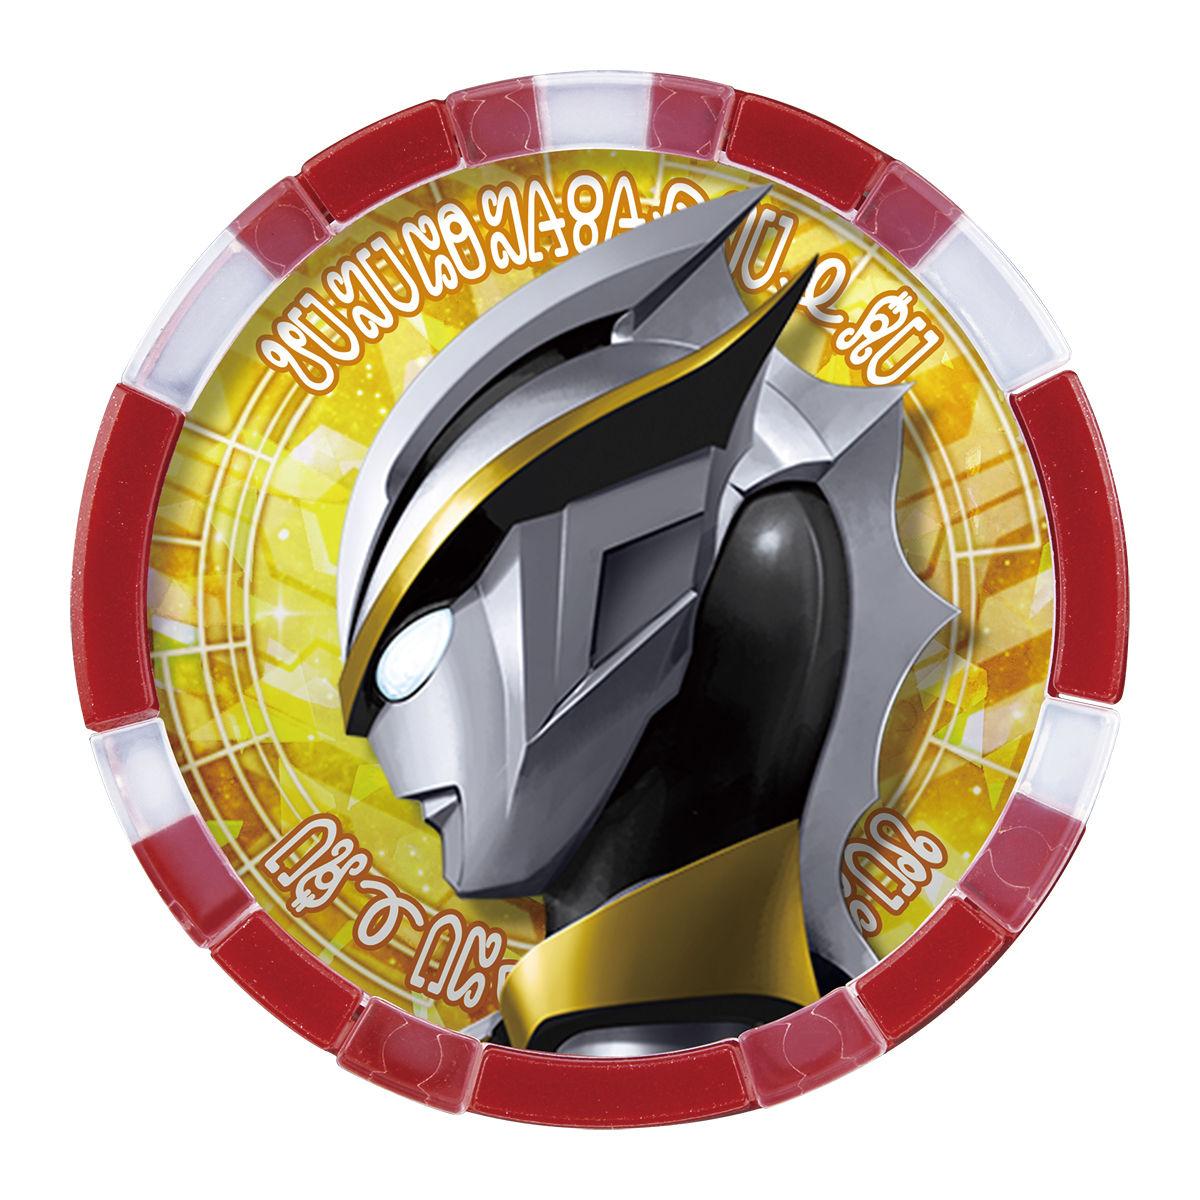 DXウルトラメダル ウルトラレジェンドセットEX02